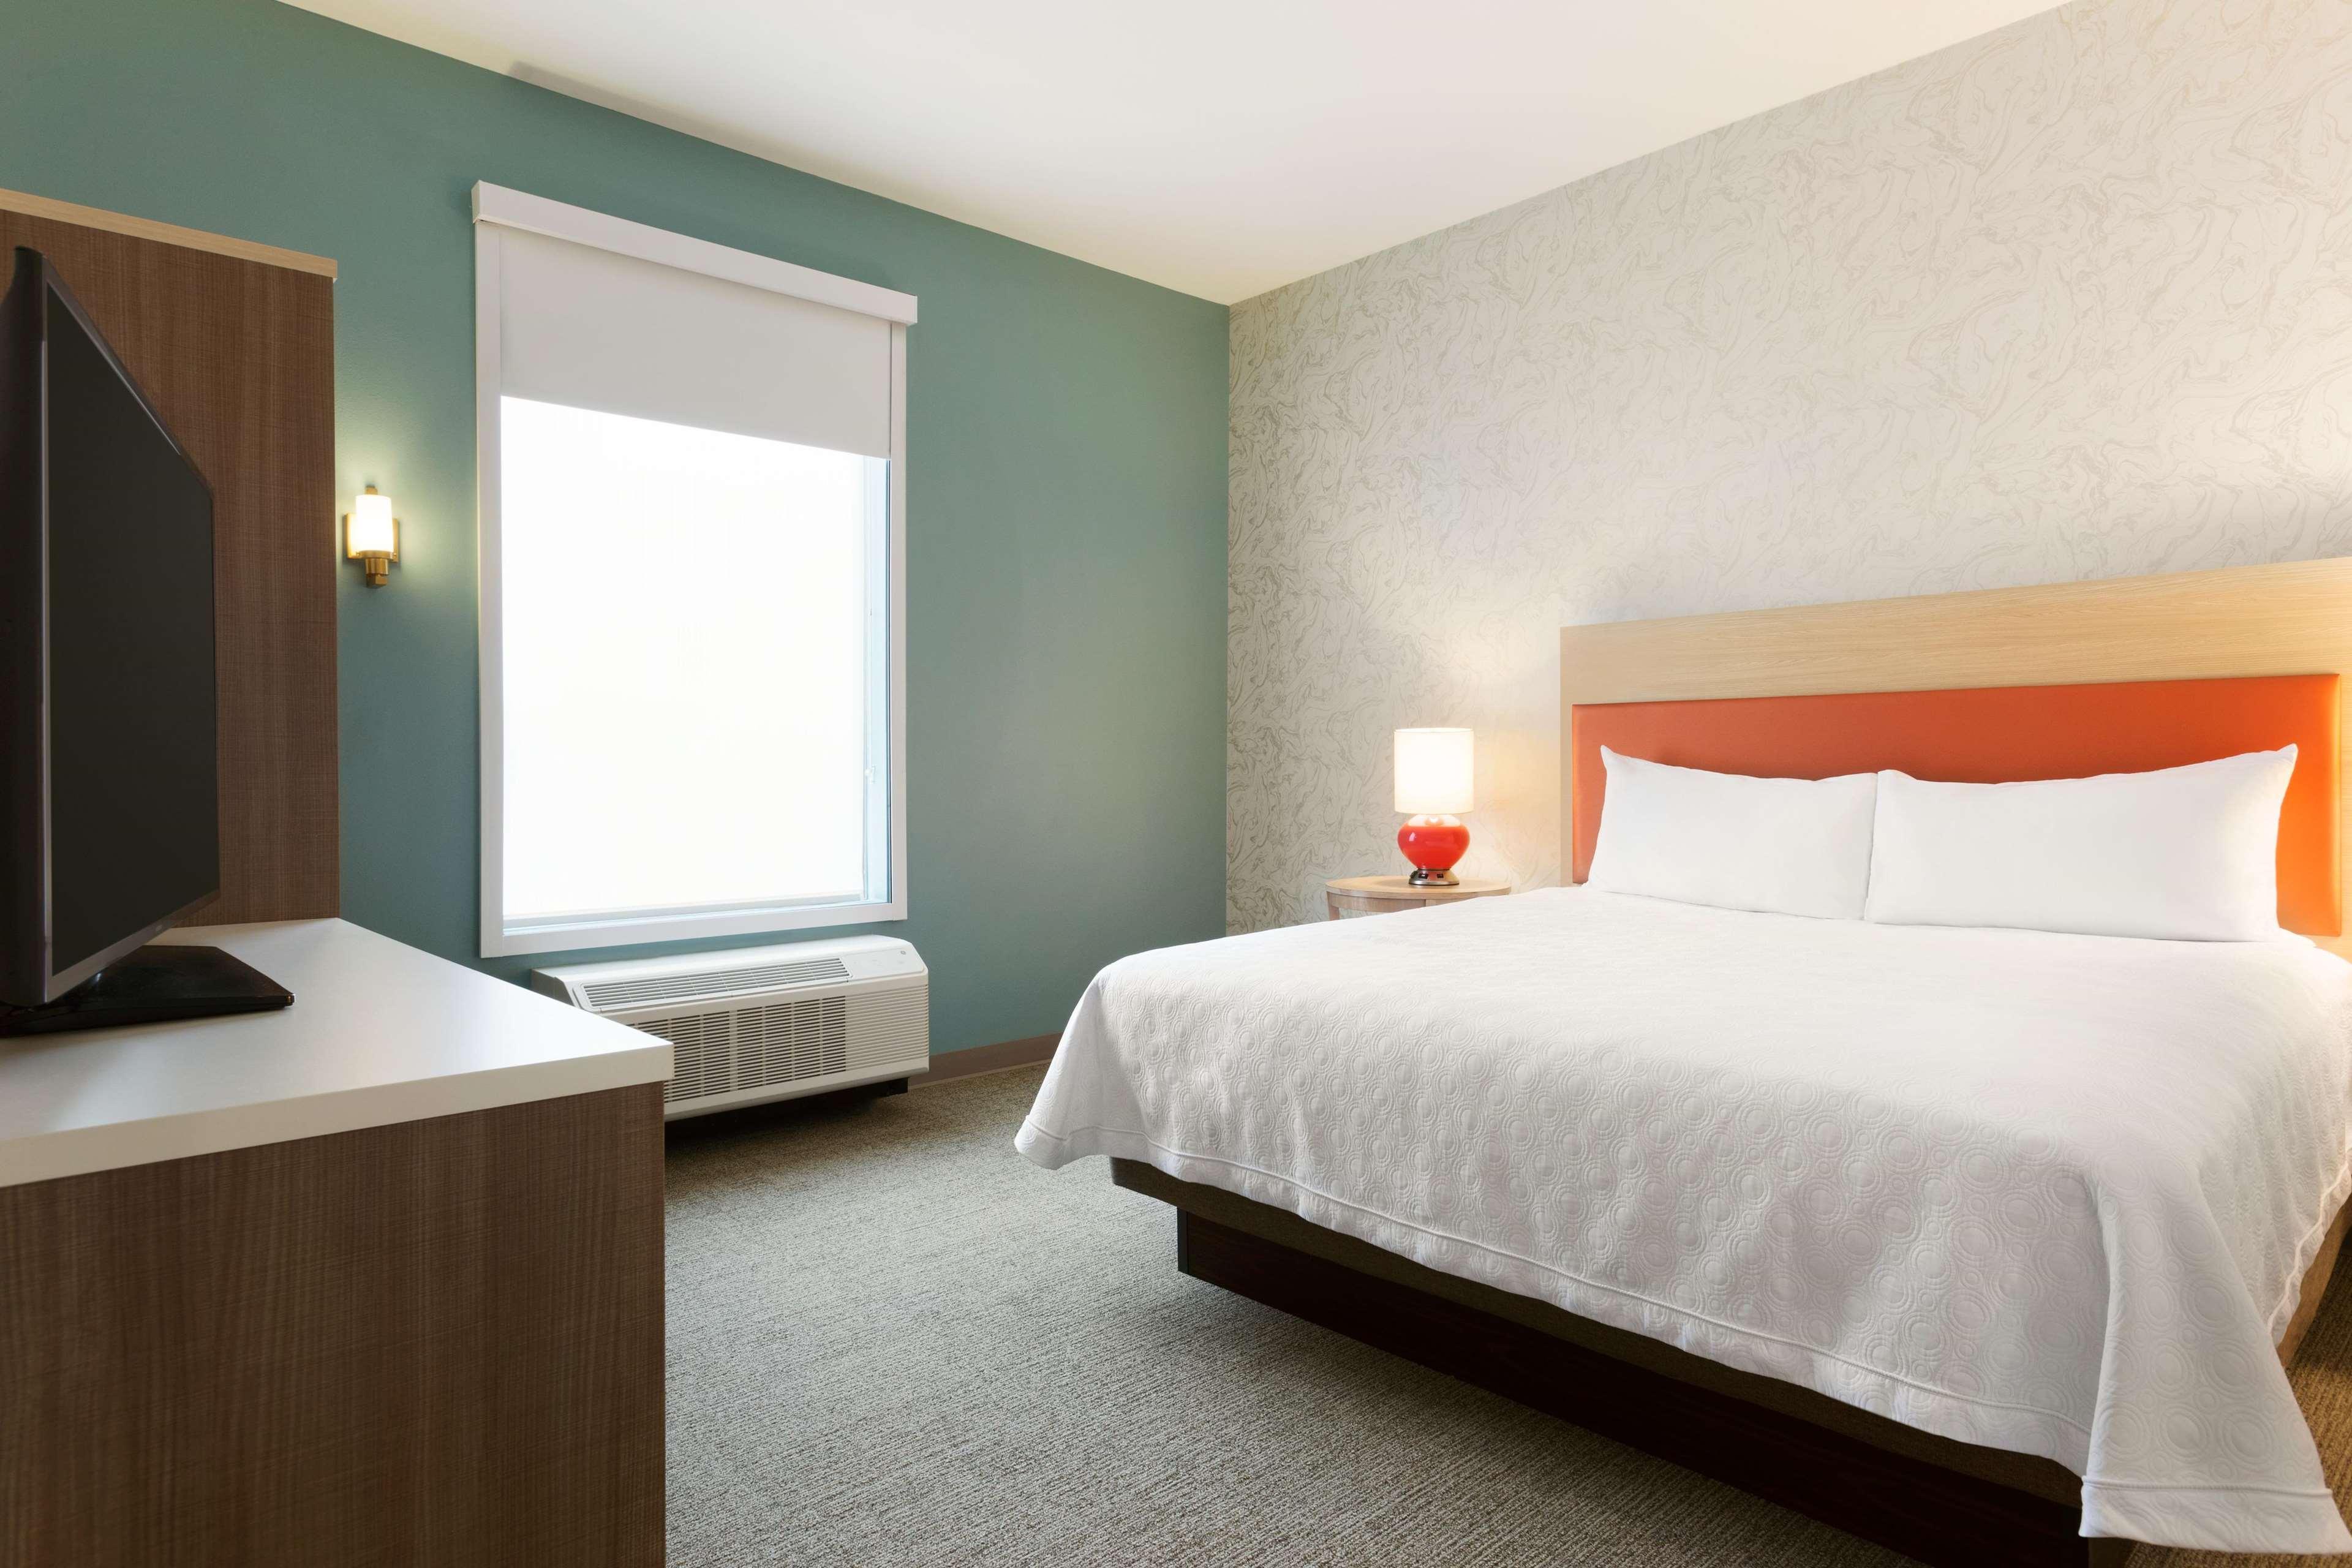 Home2 Suites by Hilton Florence Cincinnati Airport South image 32